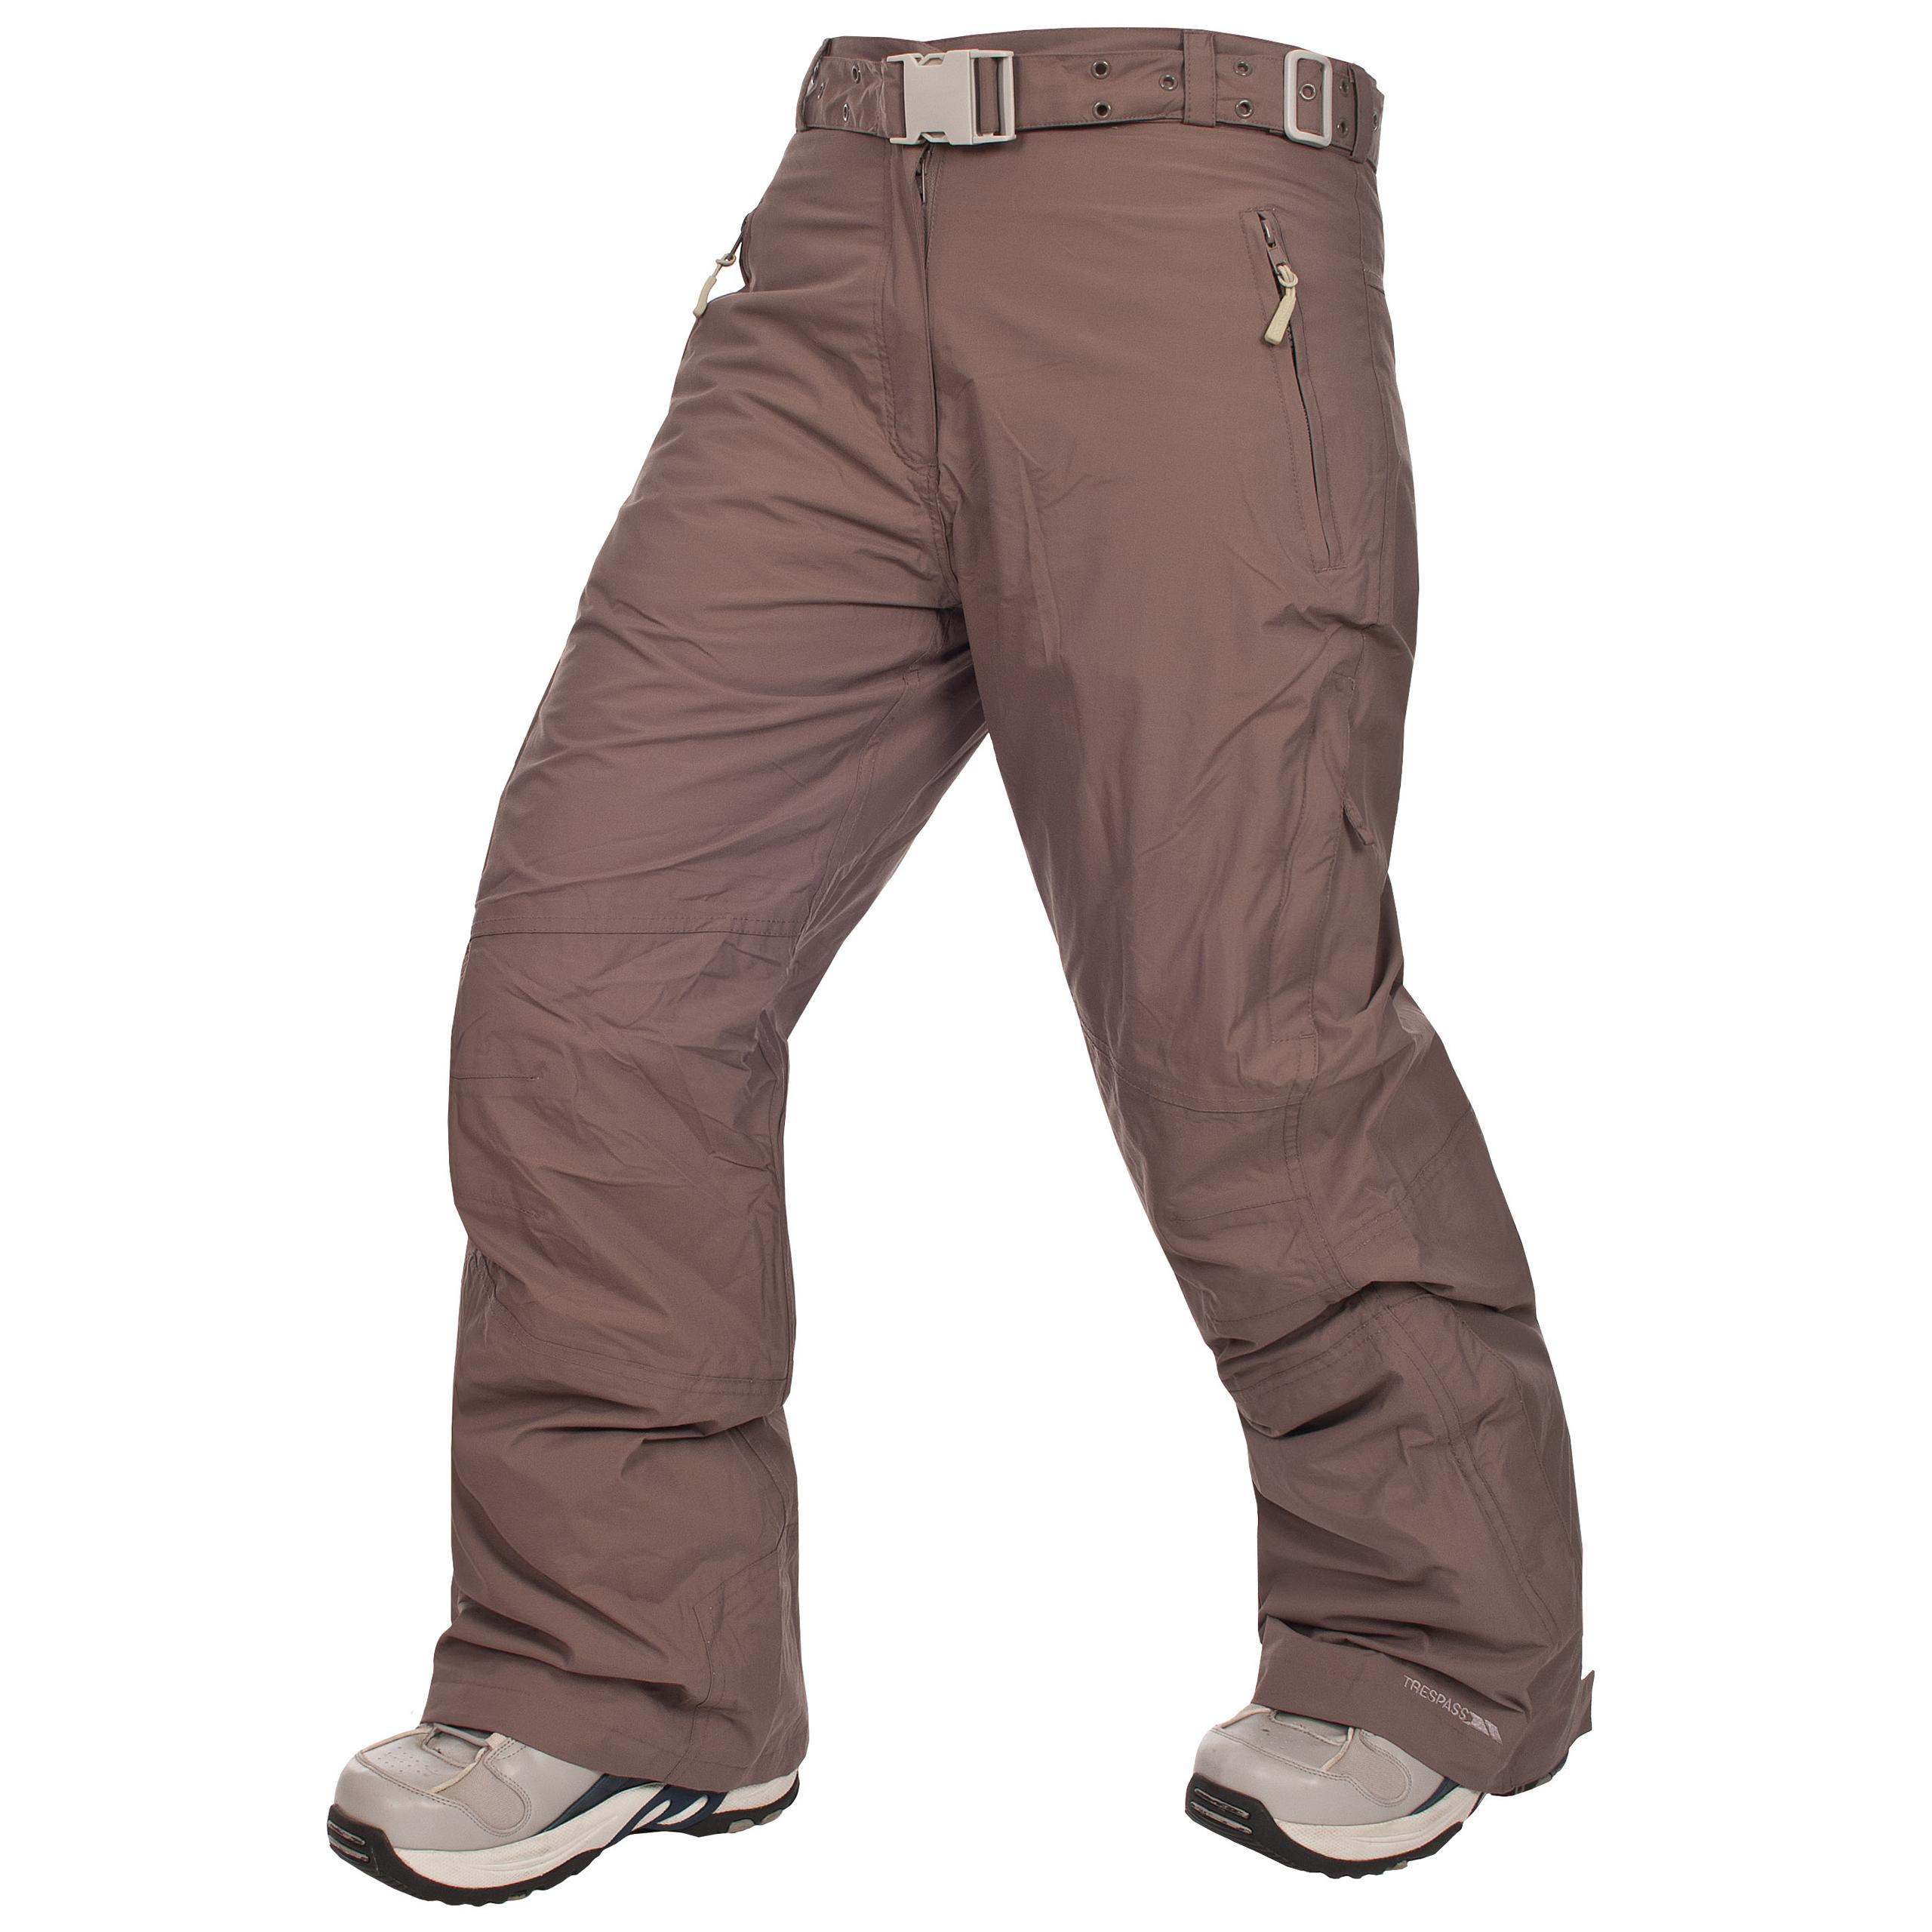 Pants FUSE Women's Ski Pants